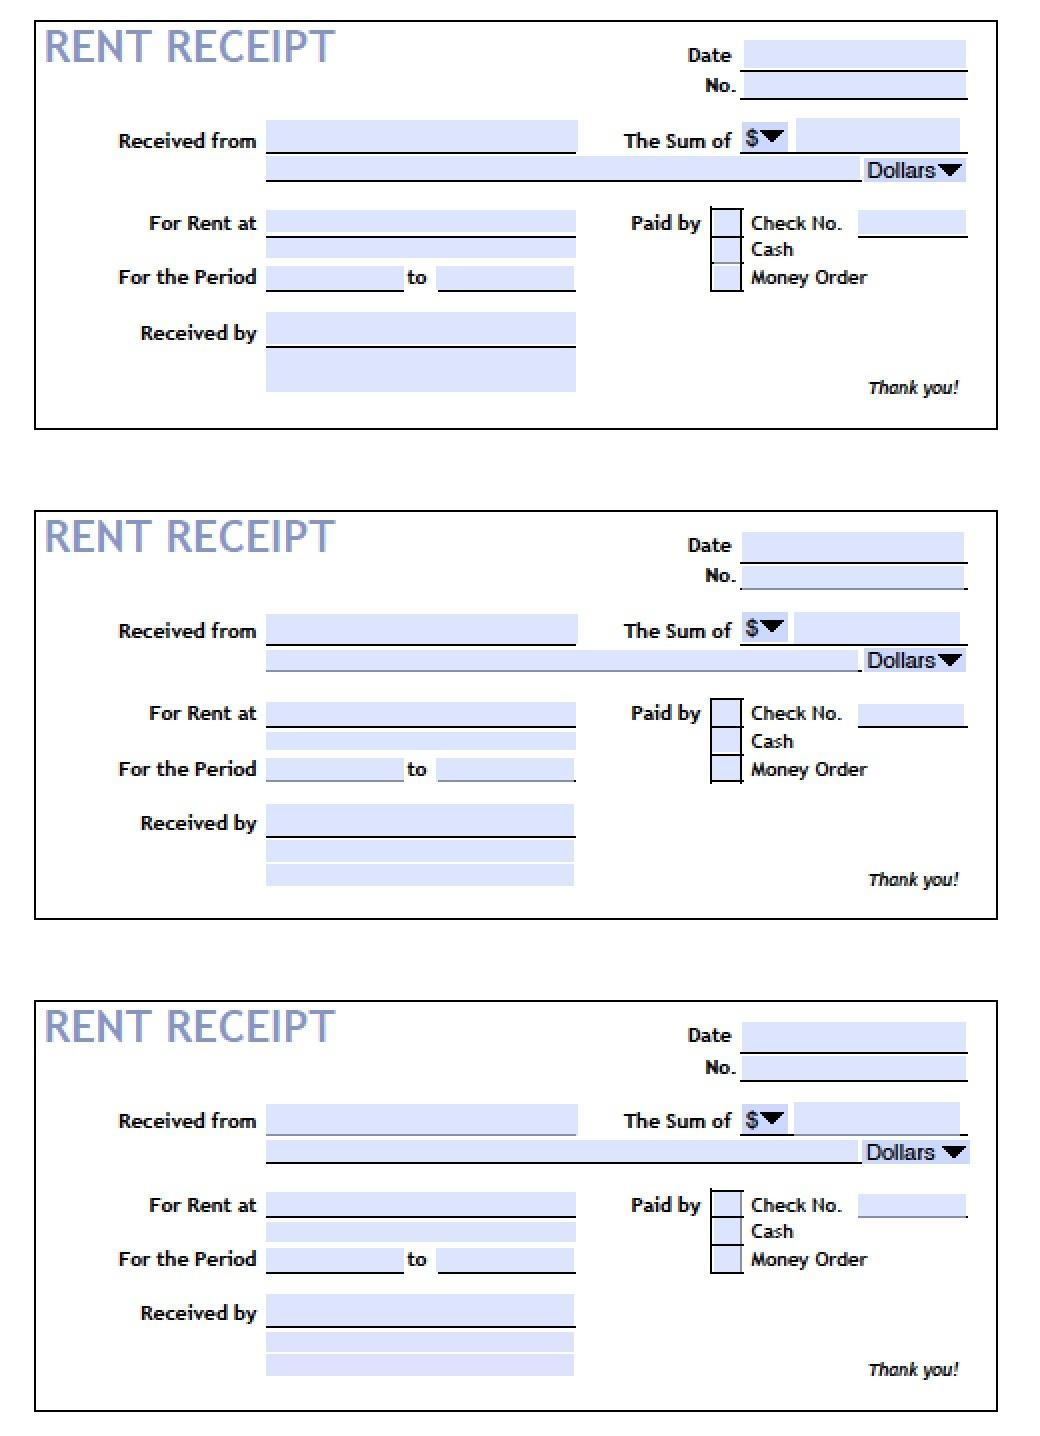 Download Printable Rent Receipt Templates | Pdf | Word | Excel - Free Printable Rent Receipt